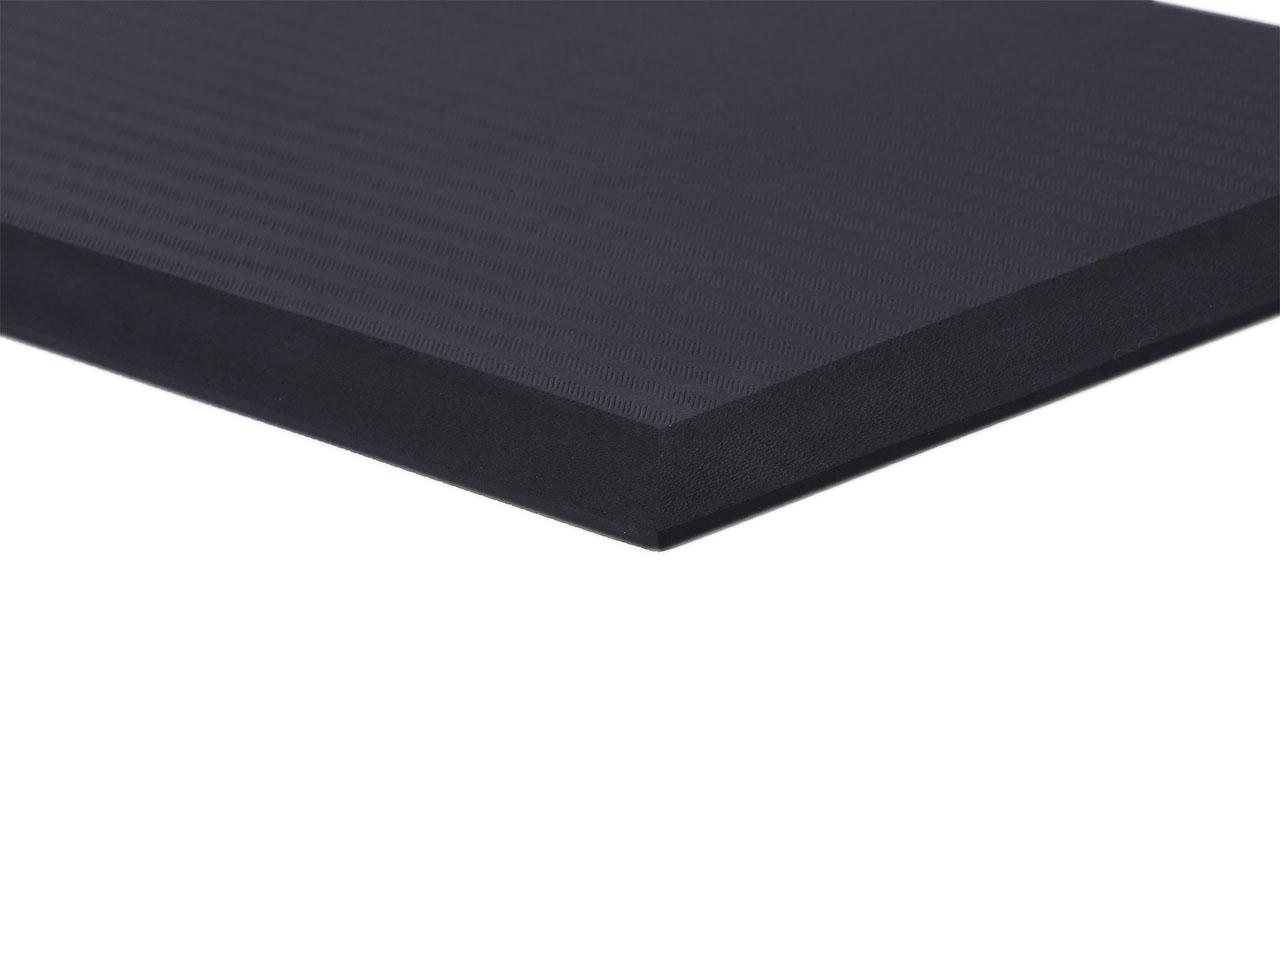 Marvelous Tpe Standing Desk Mat Sheep Mats Download Free Architecture Designs Itiscsunscenecom